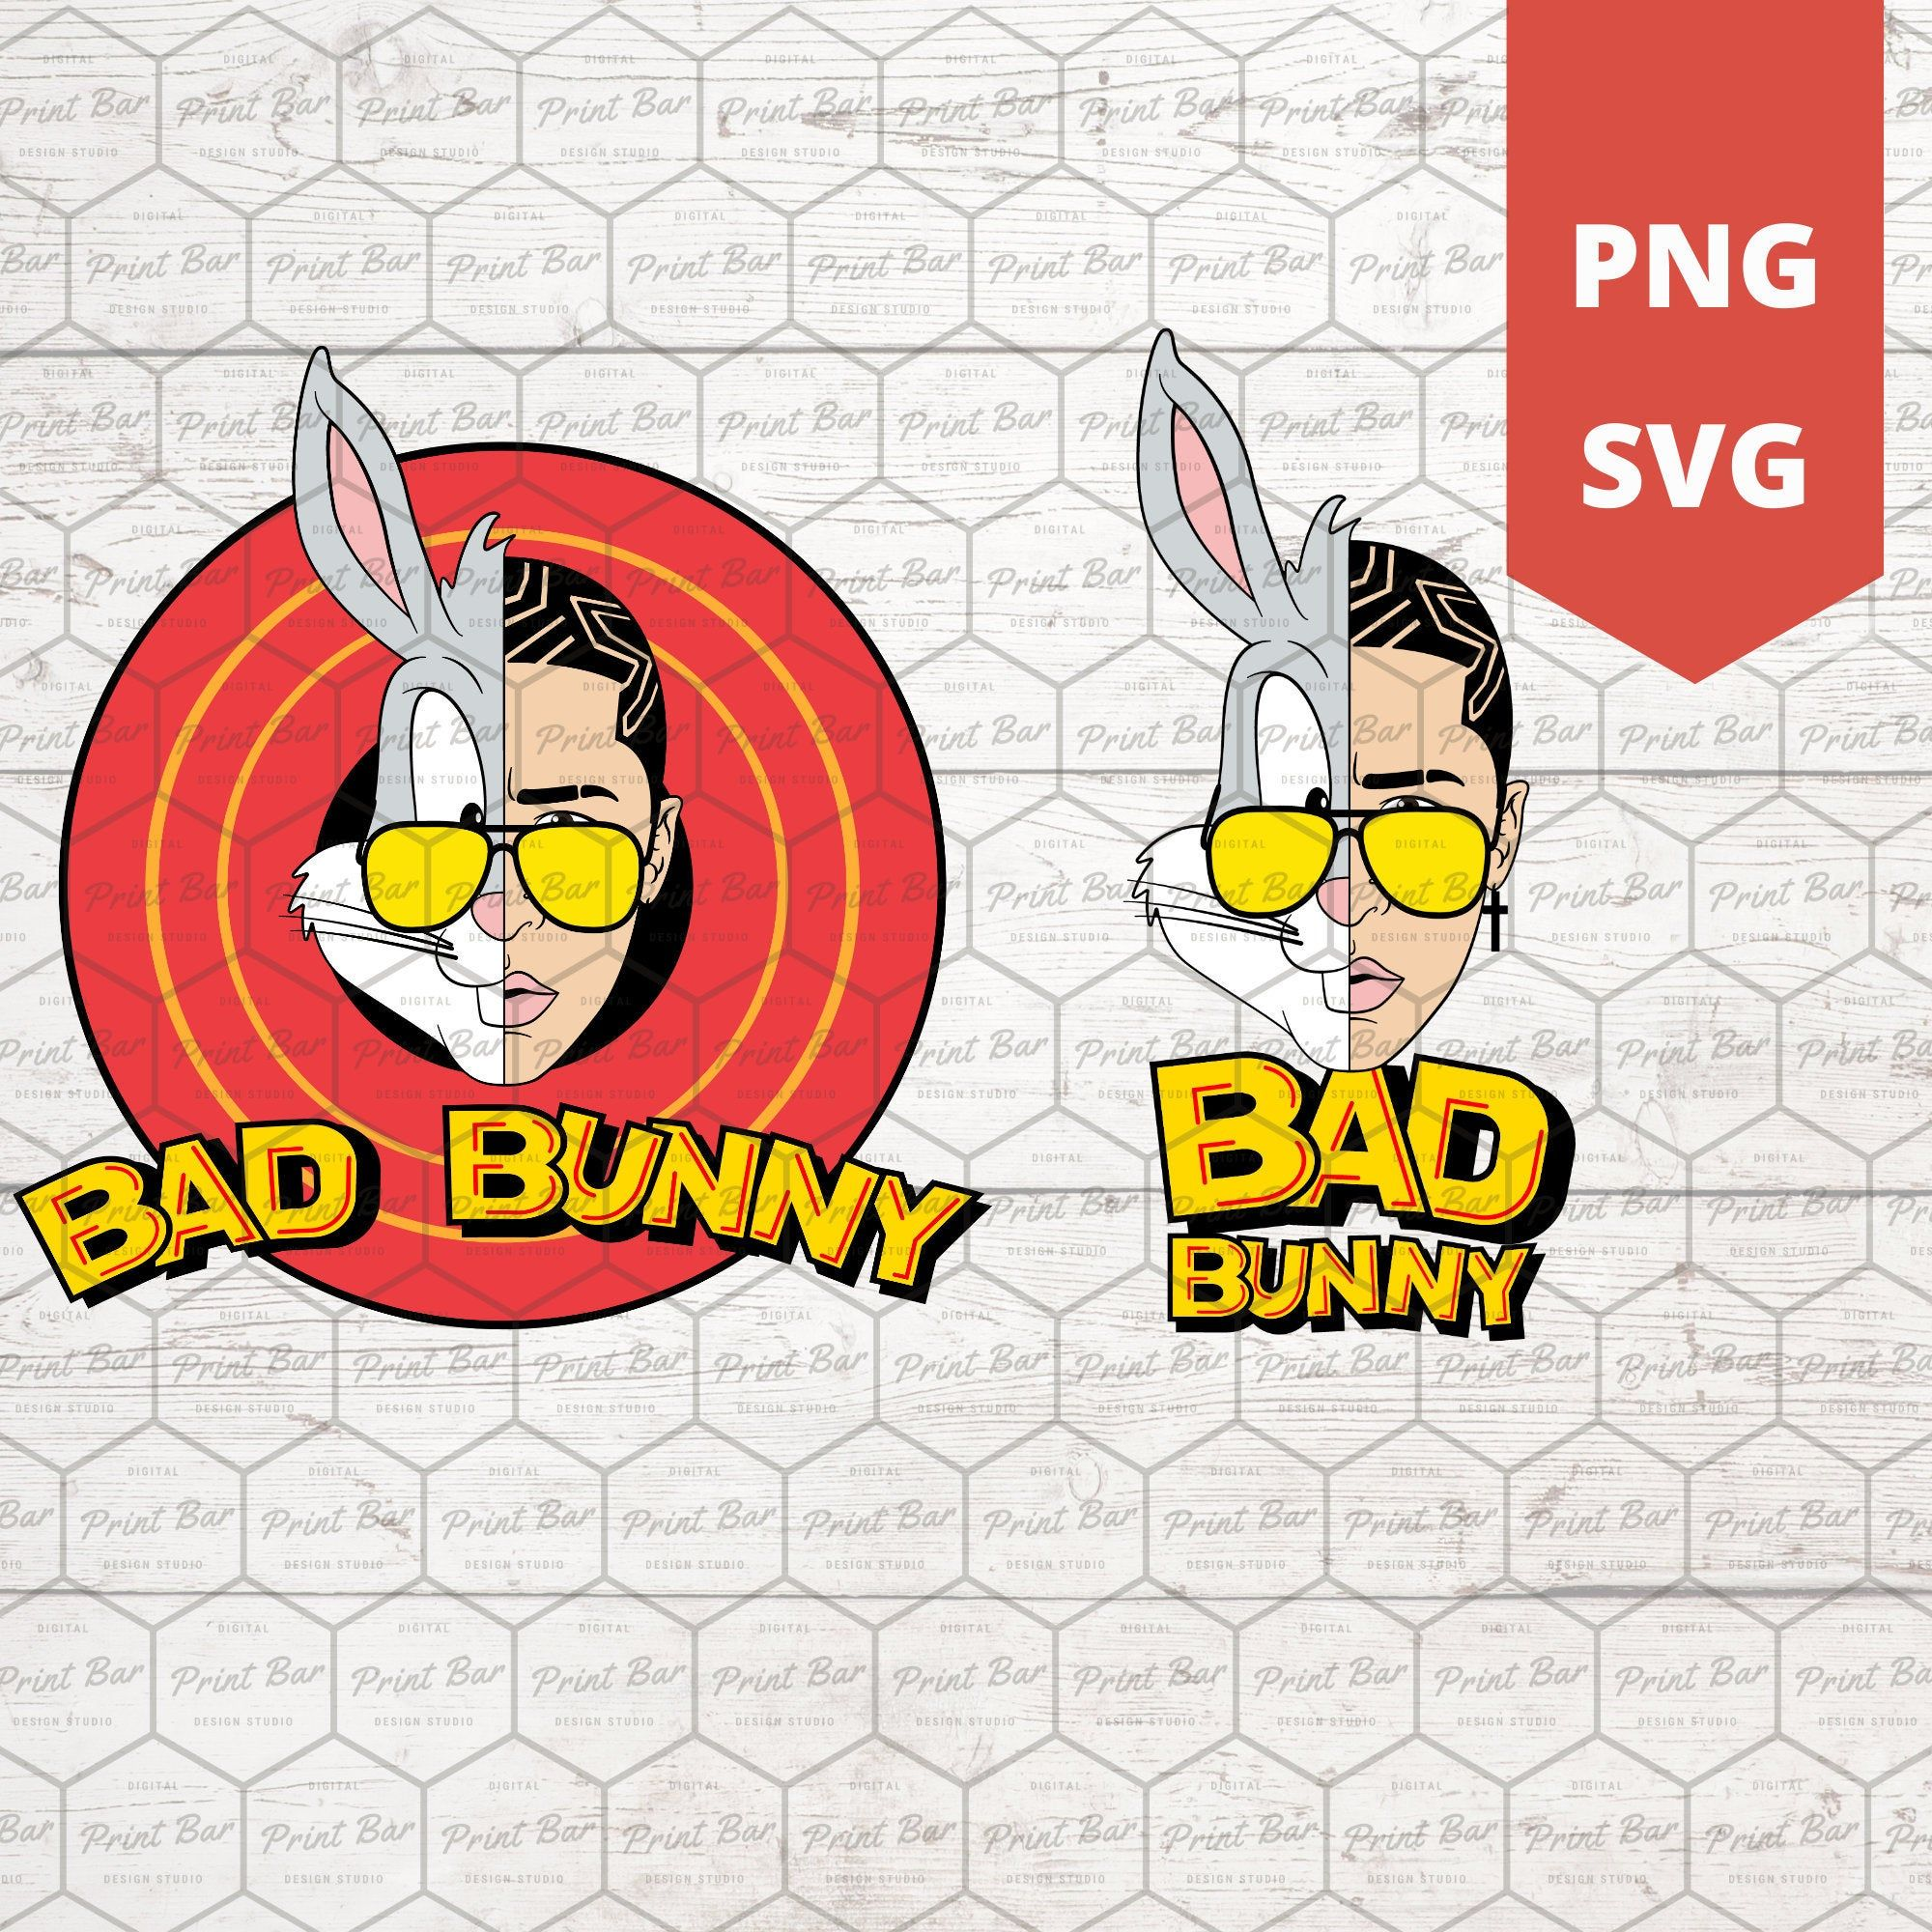 Bugs Bad Bunny Png Svg Instant Download Https Etsy Me 3f6ece0 Badbunnyparty Badbunnysvg Badbunnyrapper Badbunnyvec Bunny Svg Bunny Painting Bunny Drawing